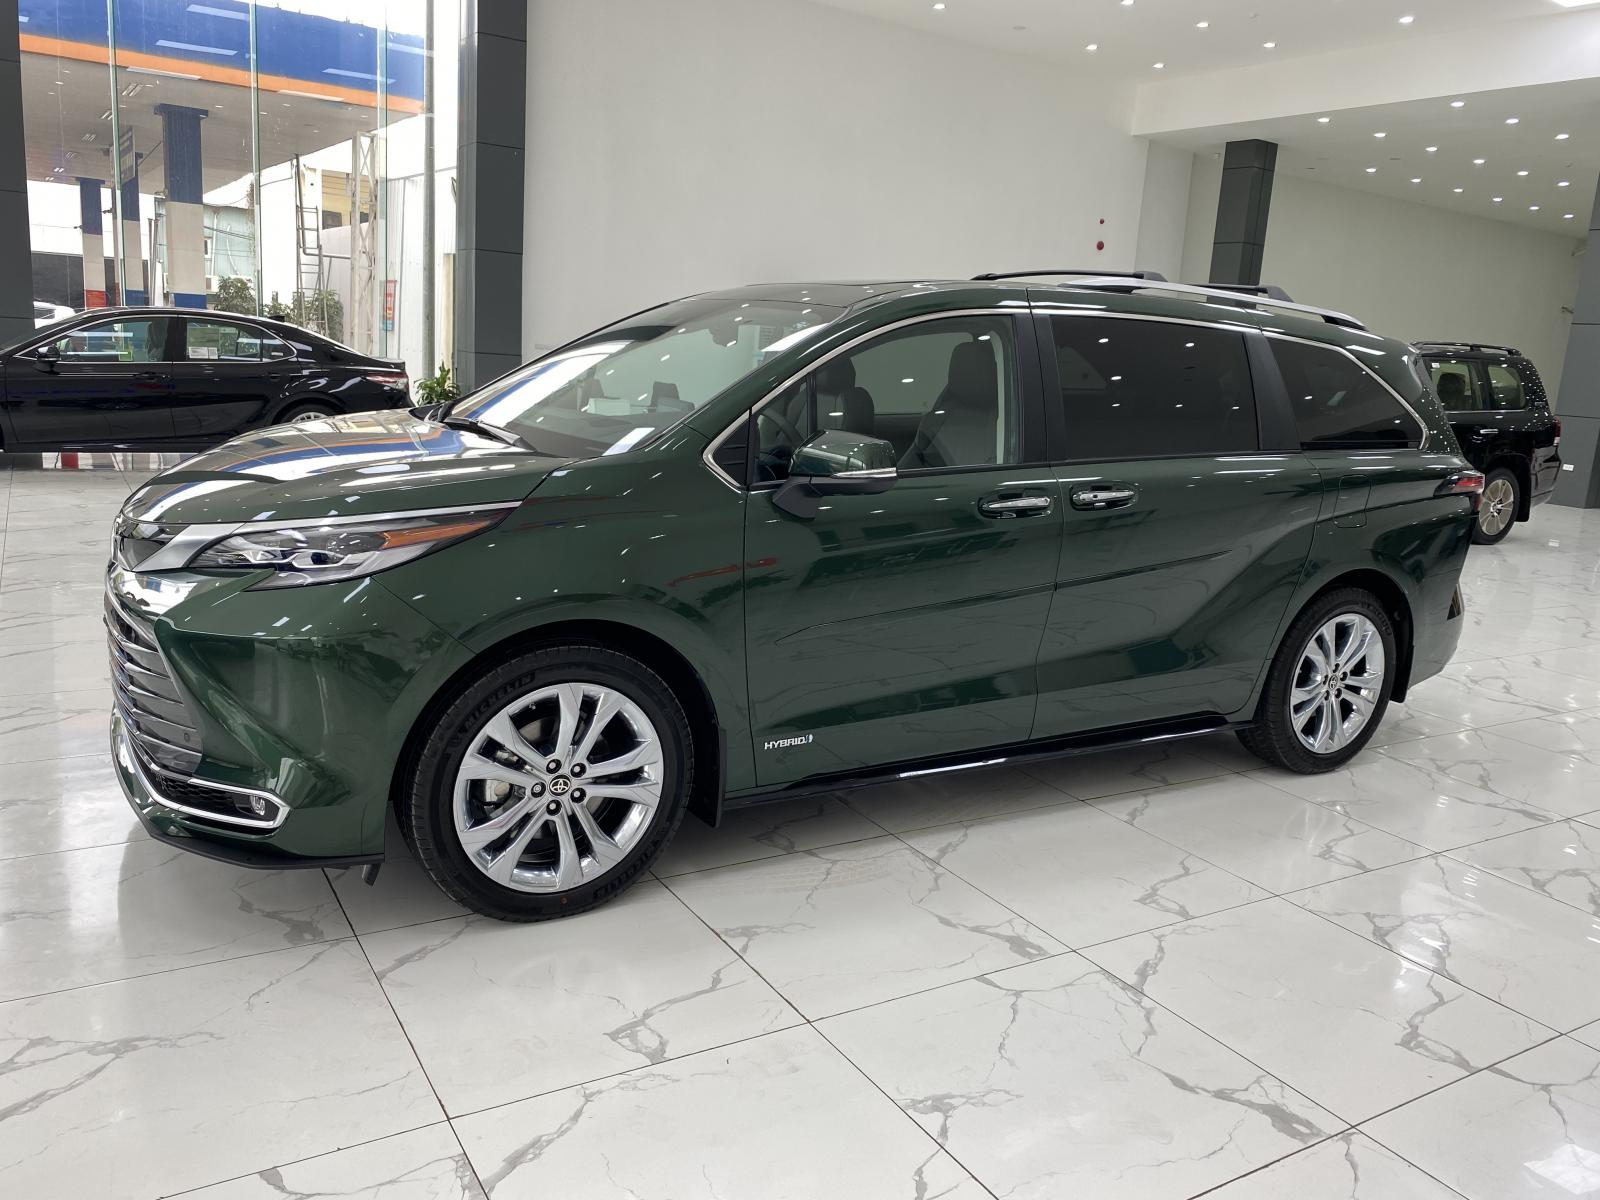 Bán Toyota Sienna Limited nhập Mỹ, sản xuất 2021,mới 100%, xe giao ngay.